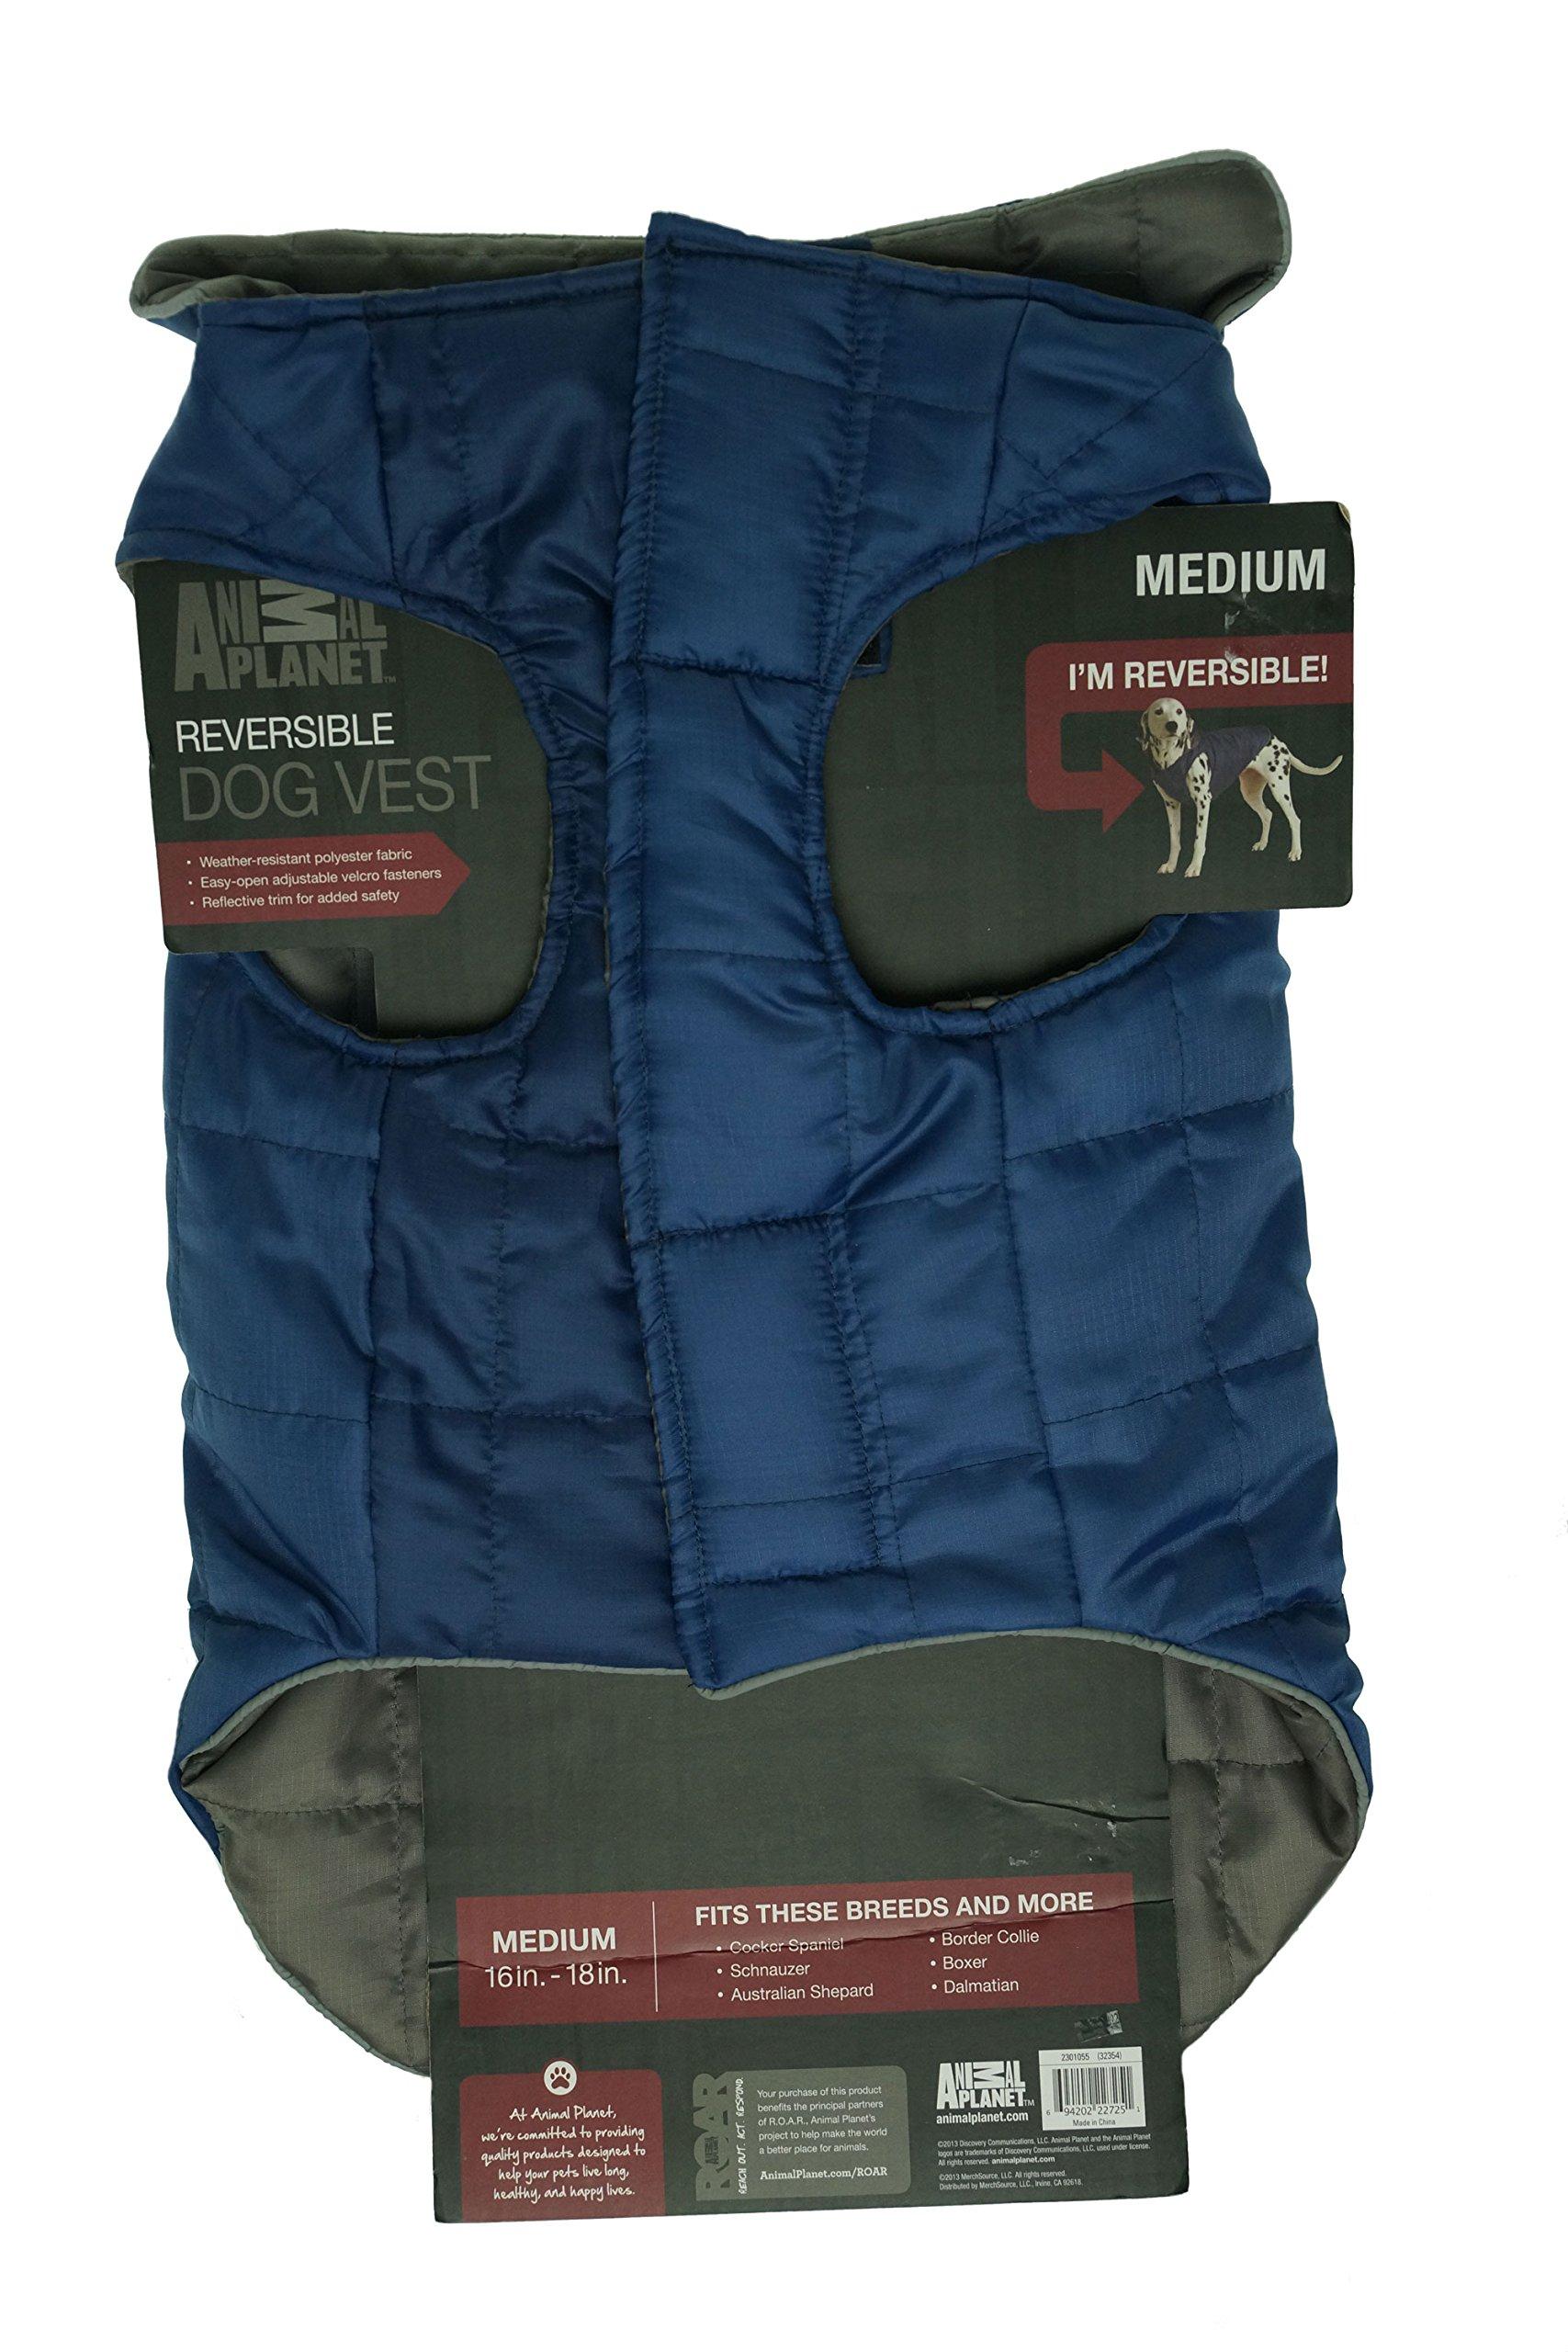 Animal Planet Reversible Dog Vest (Blue/Grey, Medium)